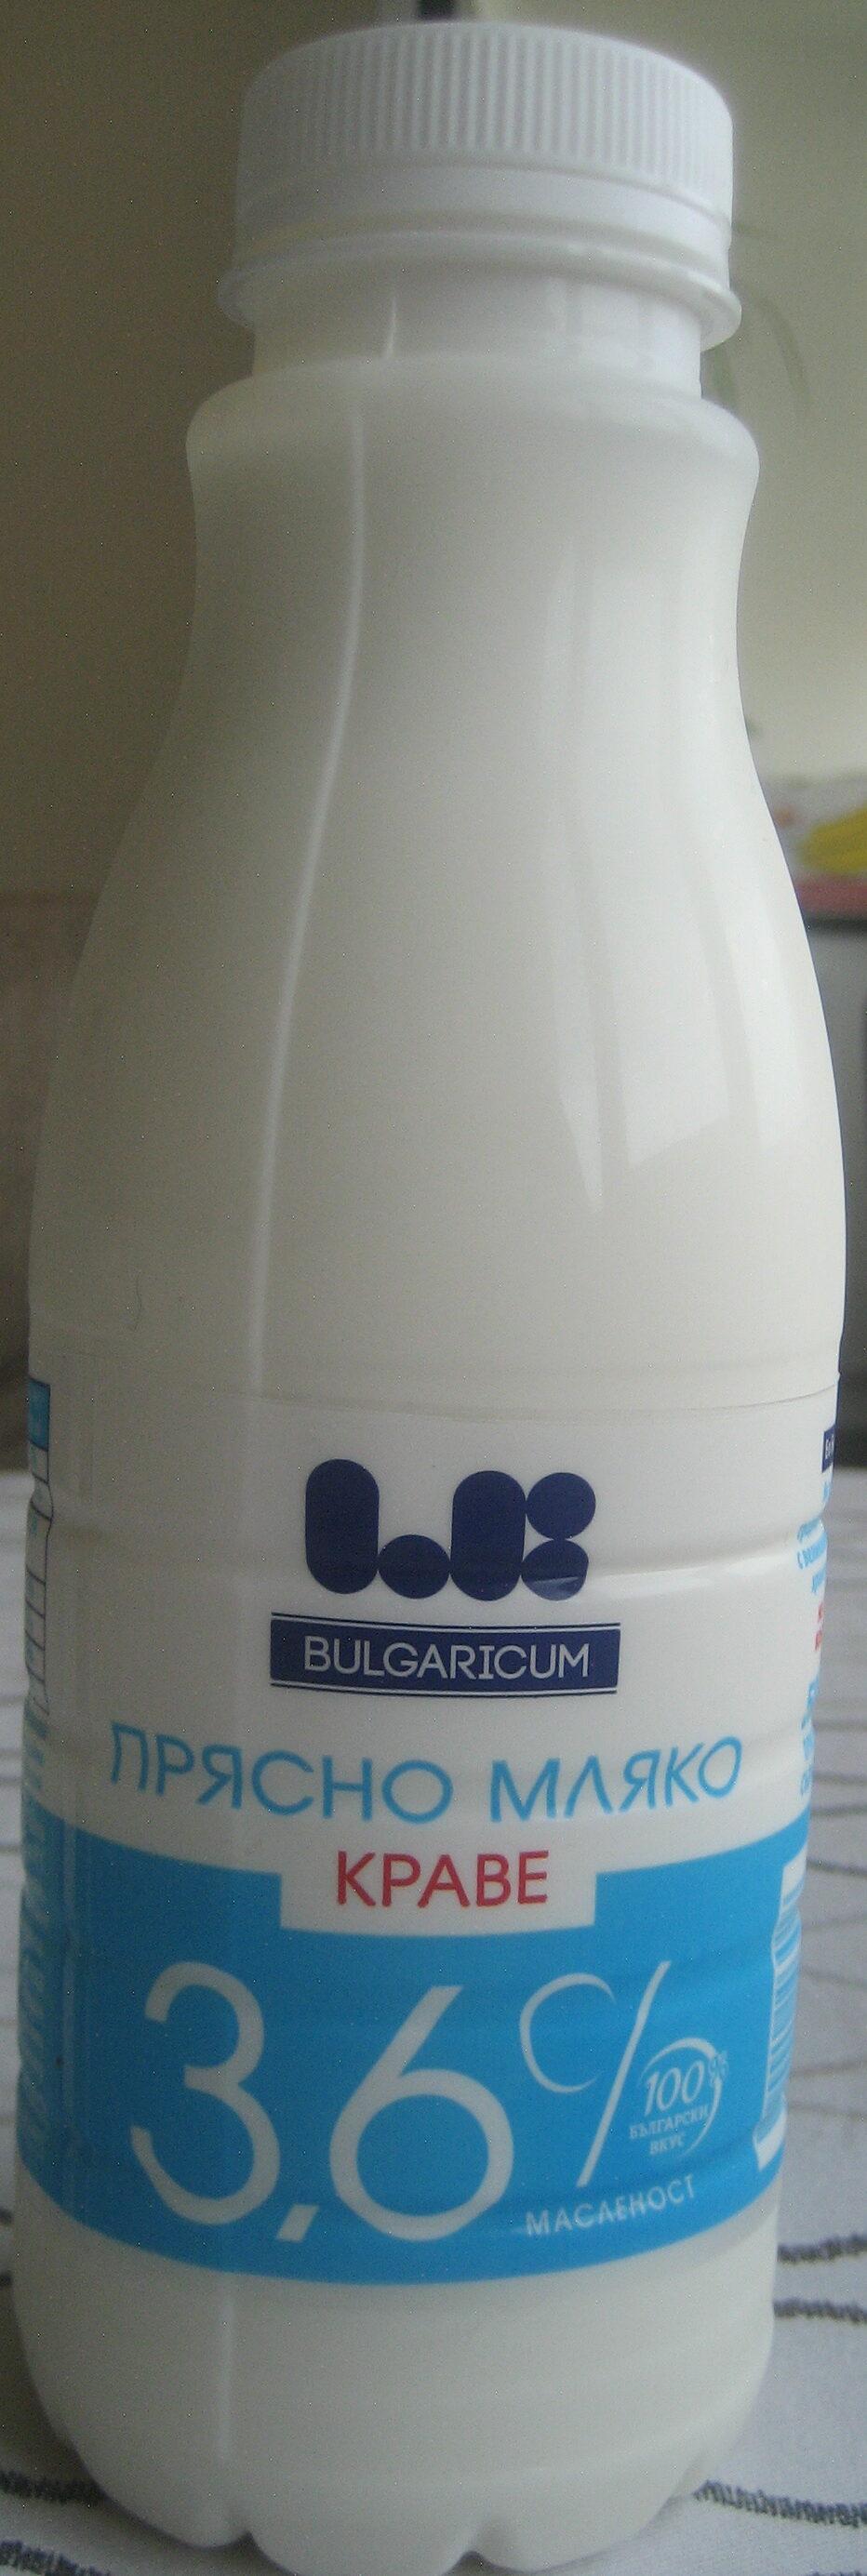 Прясно мляко краве - 3,6% масленост - Produit - bg